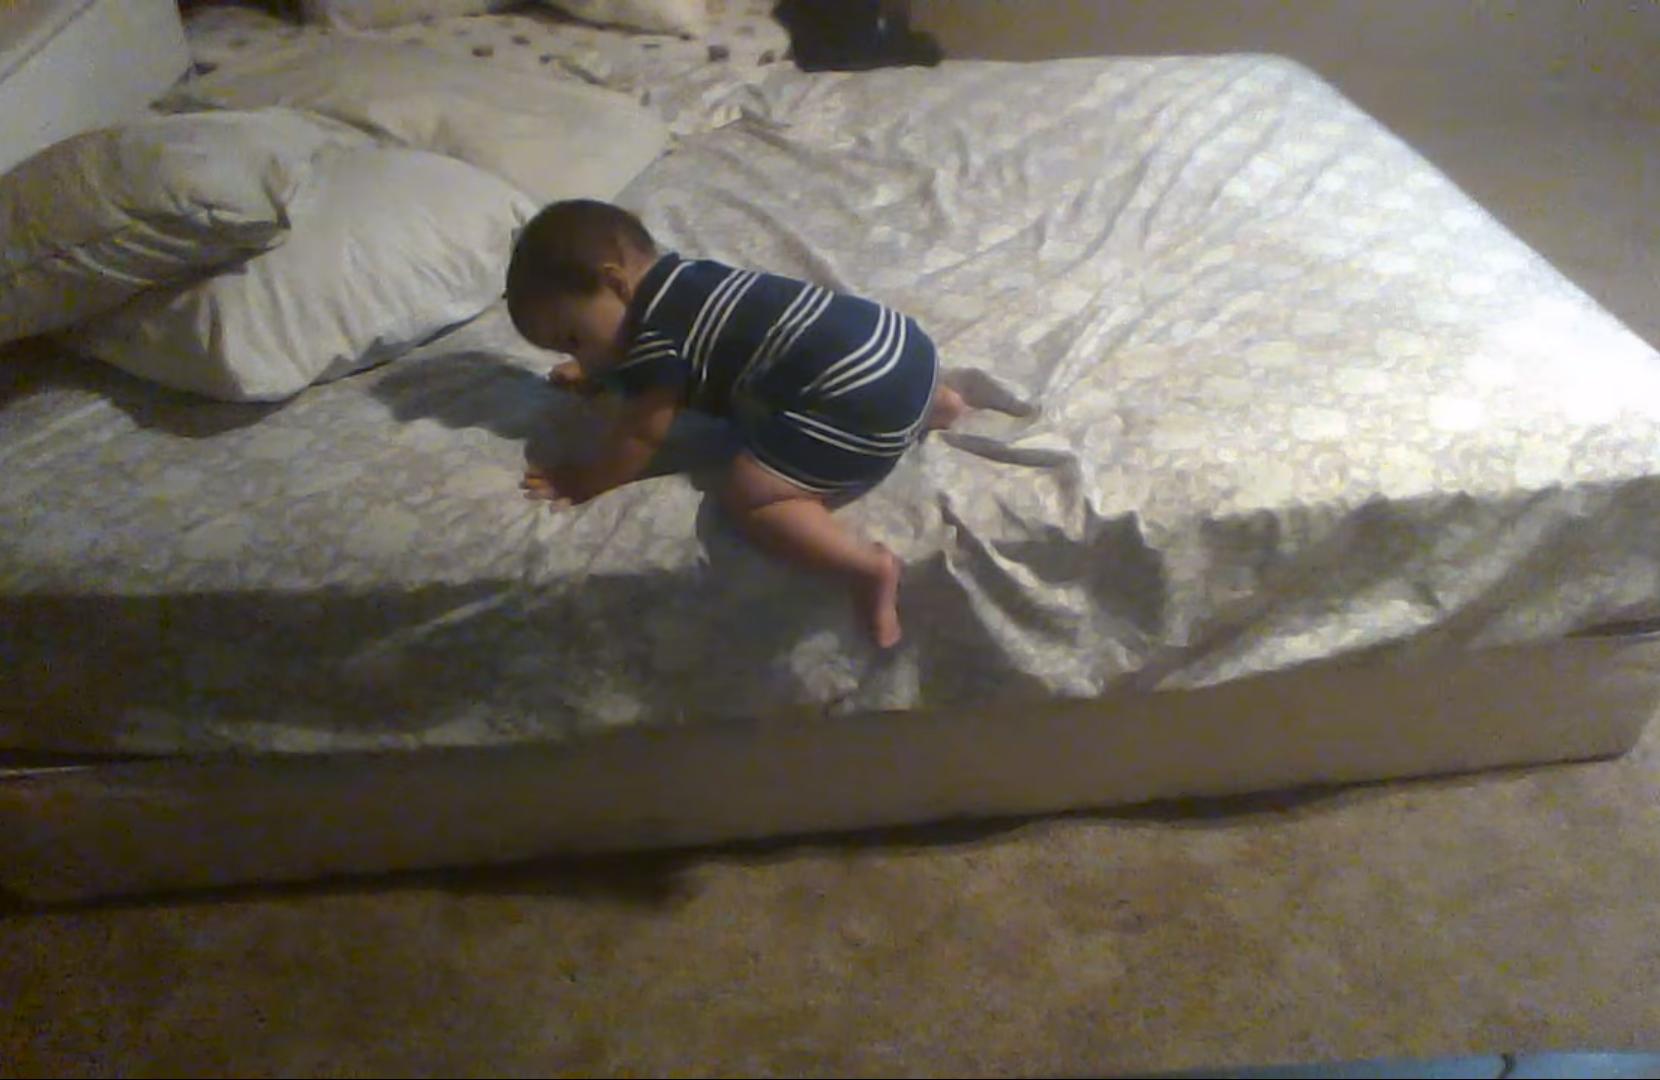 У кого малыш падал с кровати